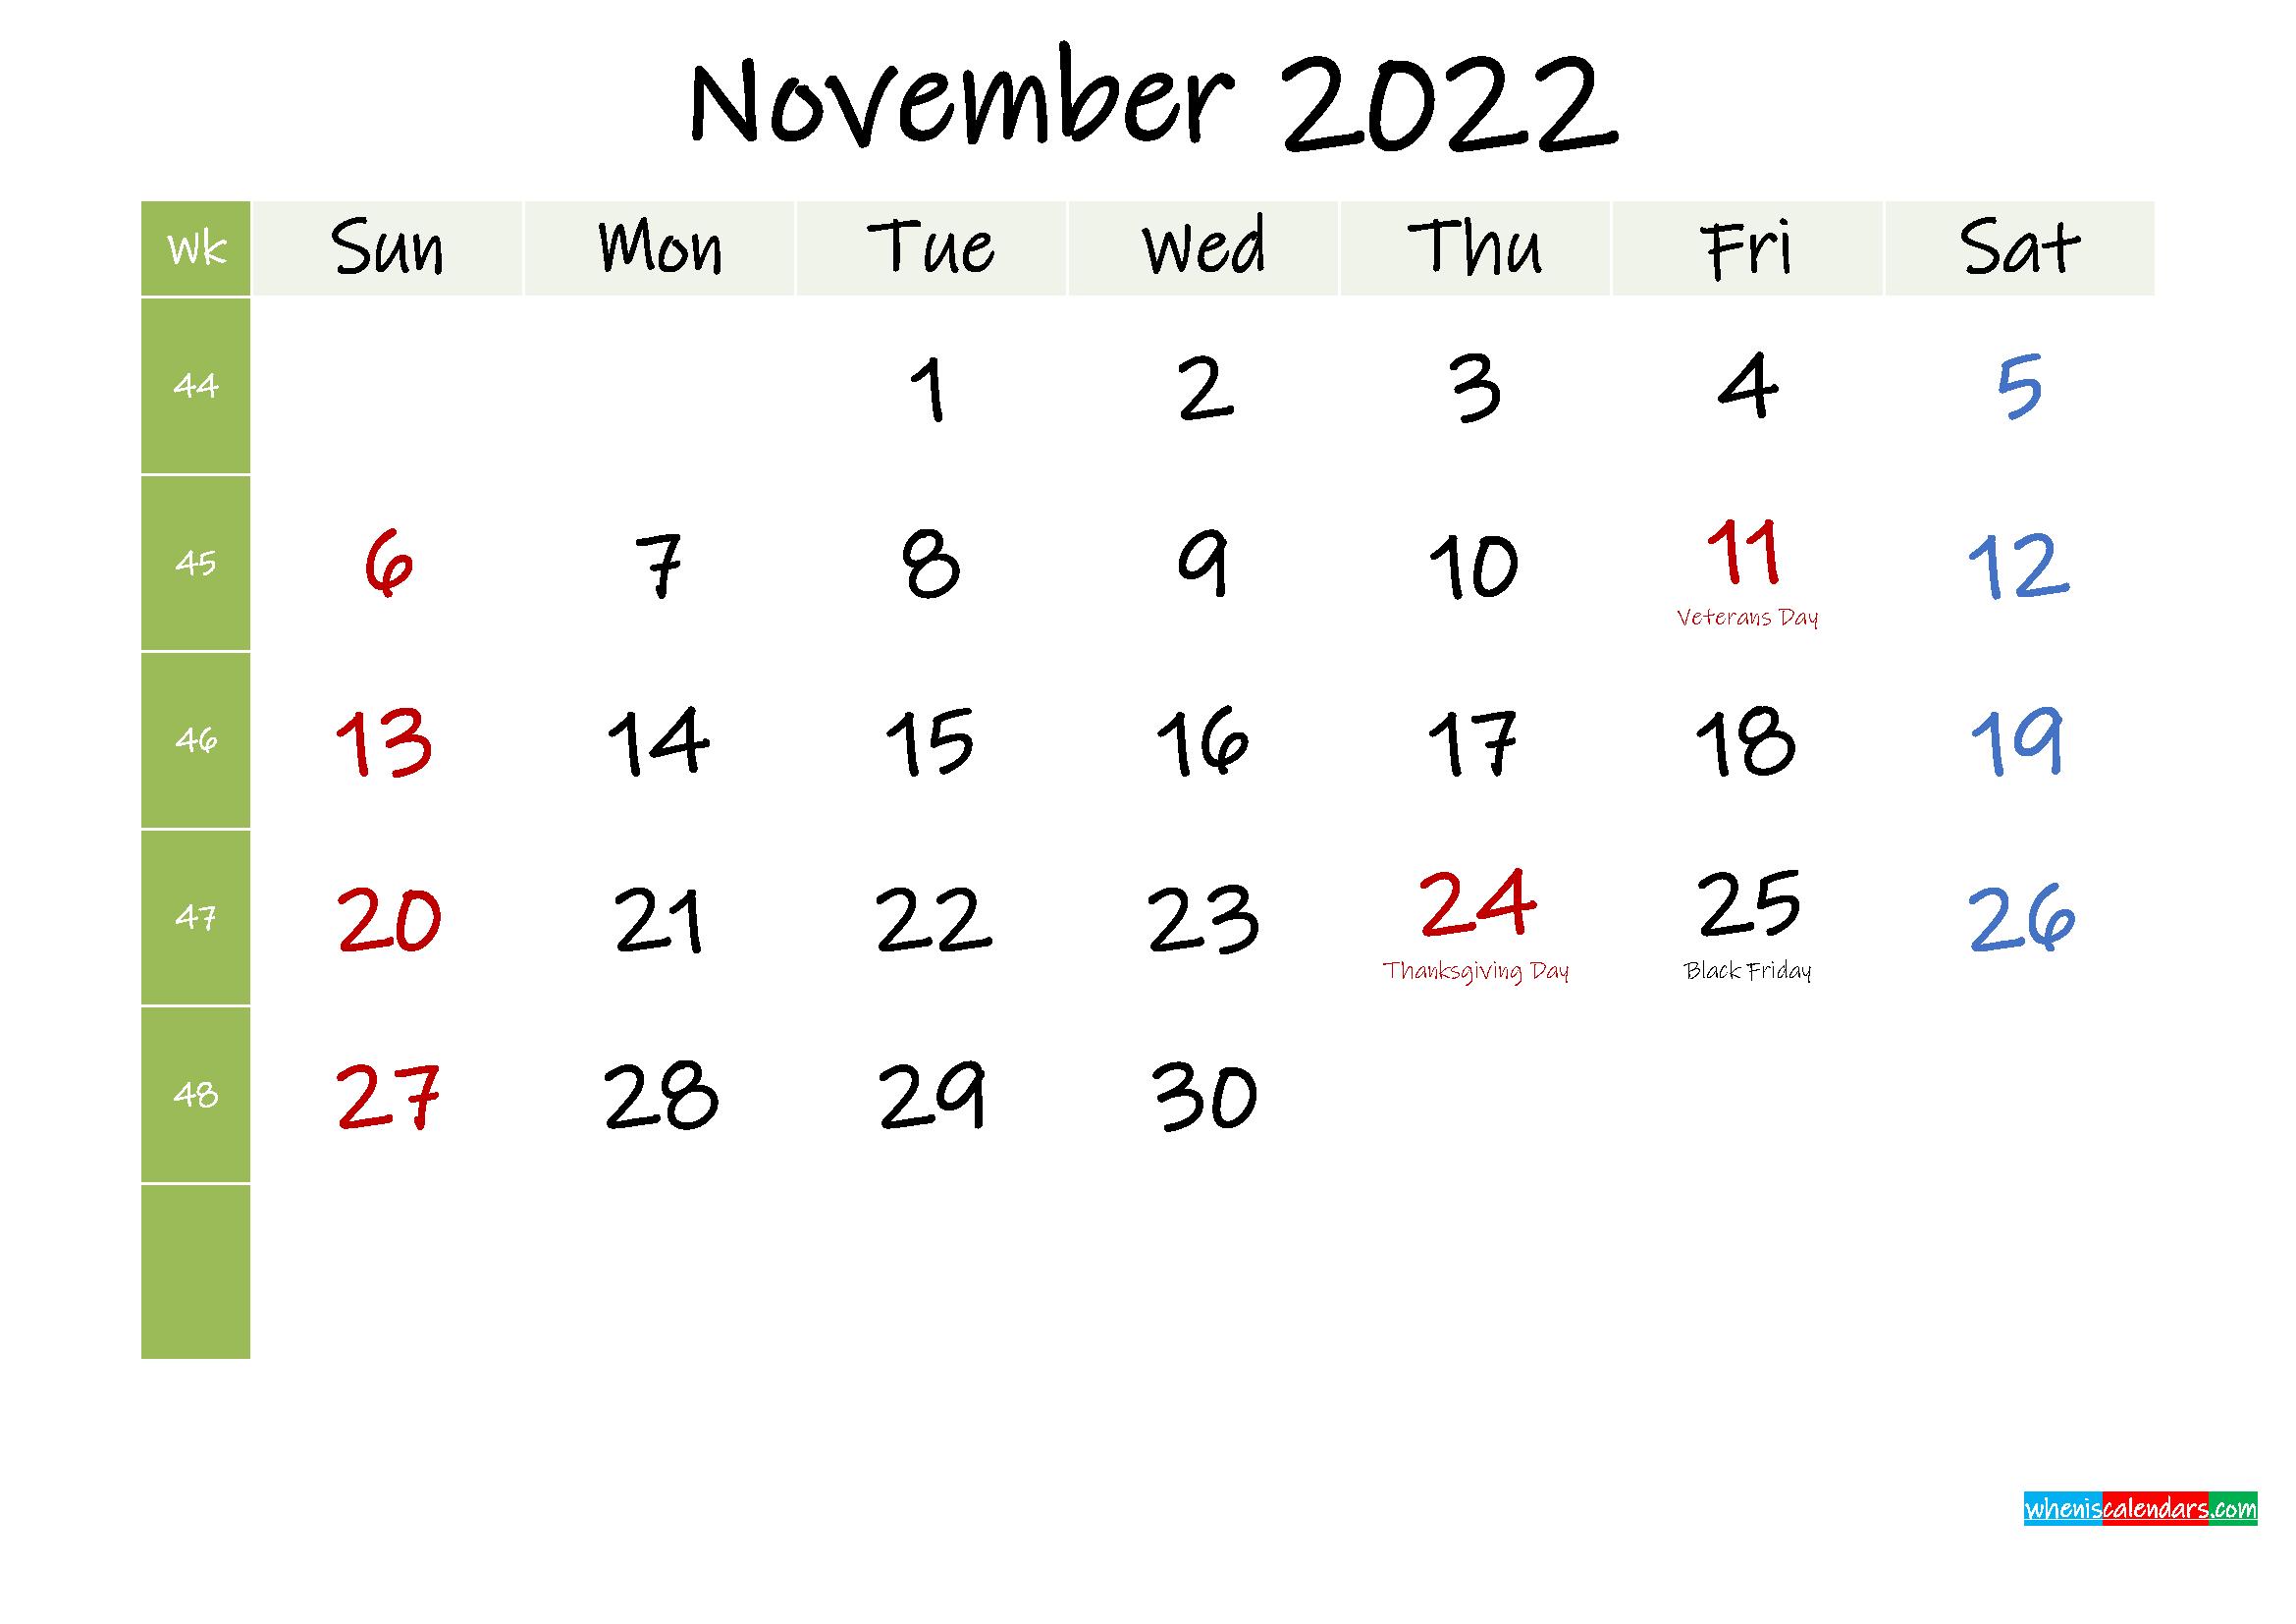 Free November 2022 Printable Calendar with Holidays